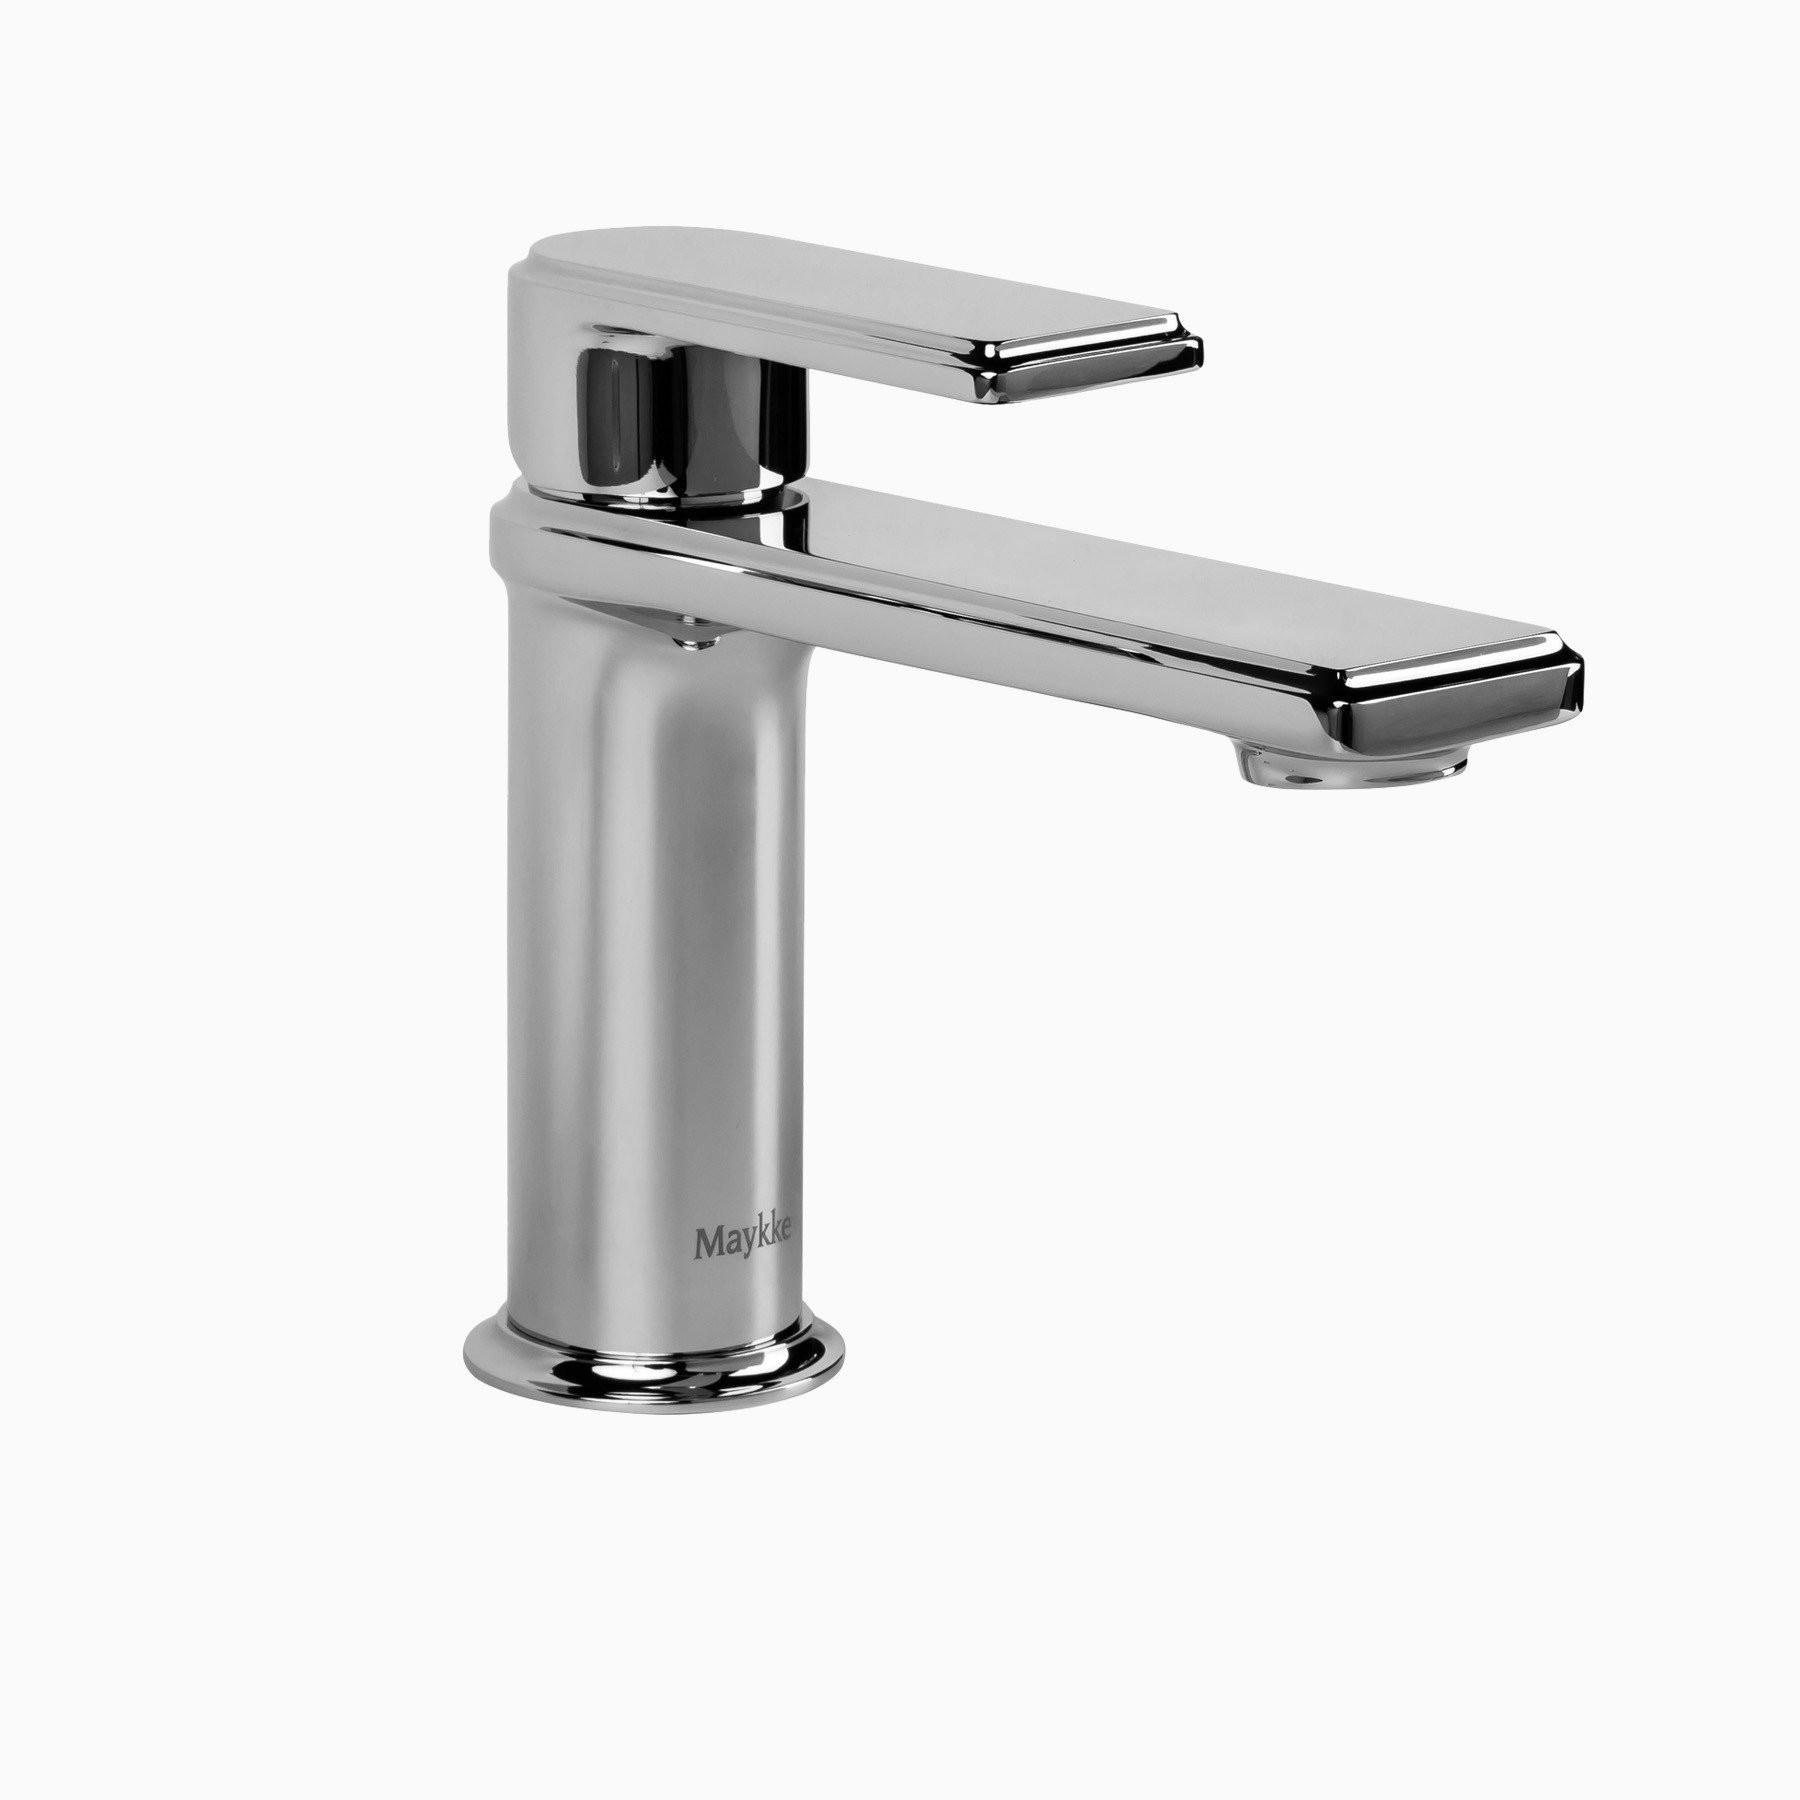 Arminius Brass Bathroom Sink Faucet Polished Chrome Single Hole Single Handle Lever Modern